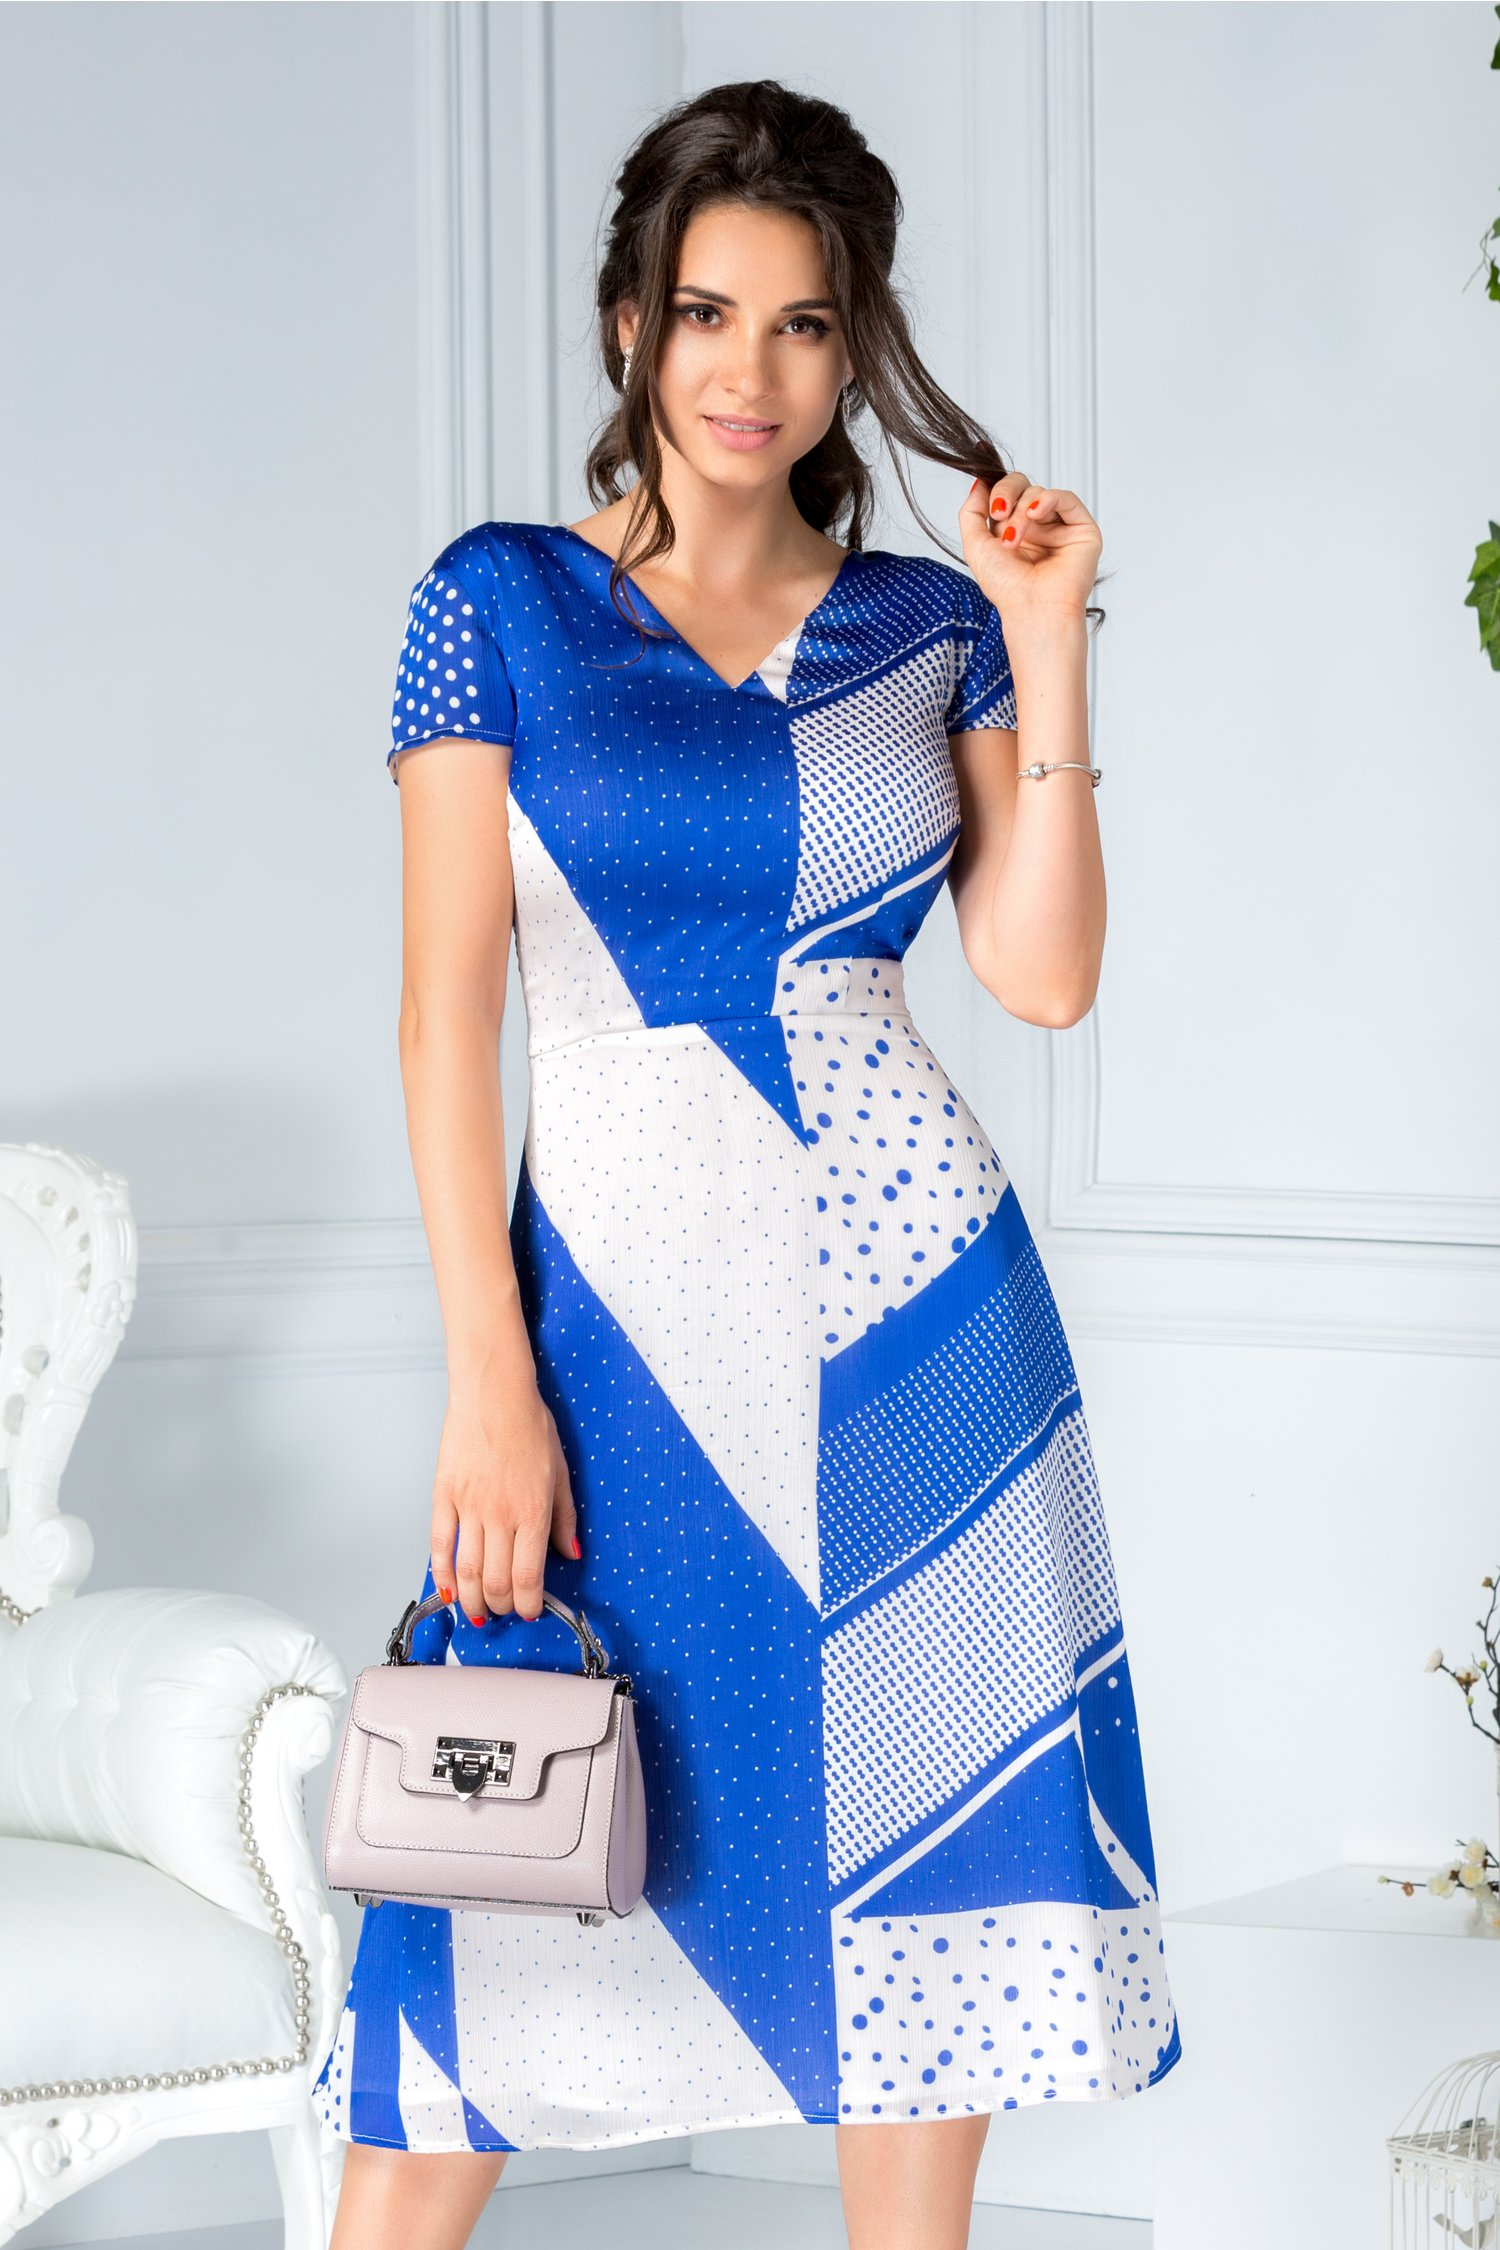 Rochie Miruna midi office de zi alb cu albastru